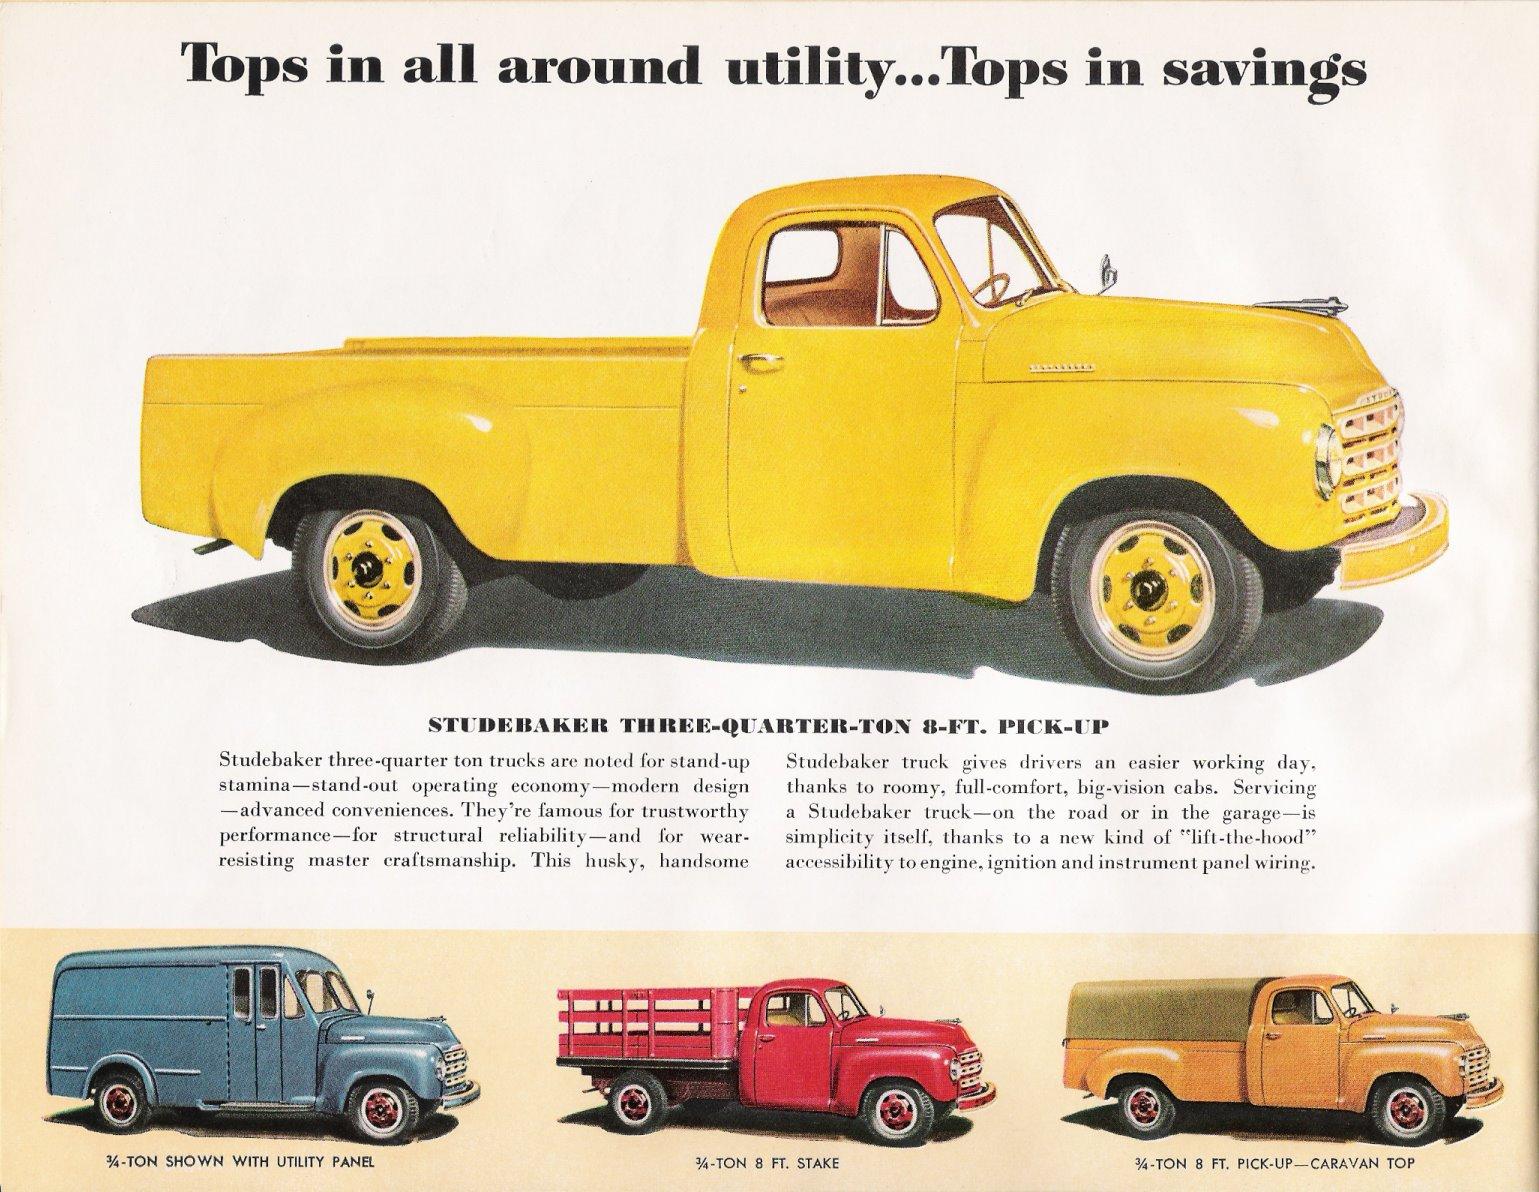 1950 Studebaker Truck Brochure